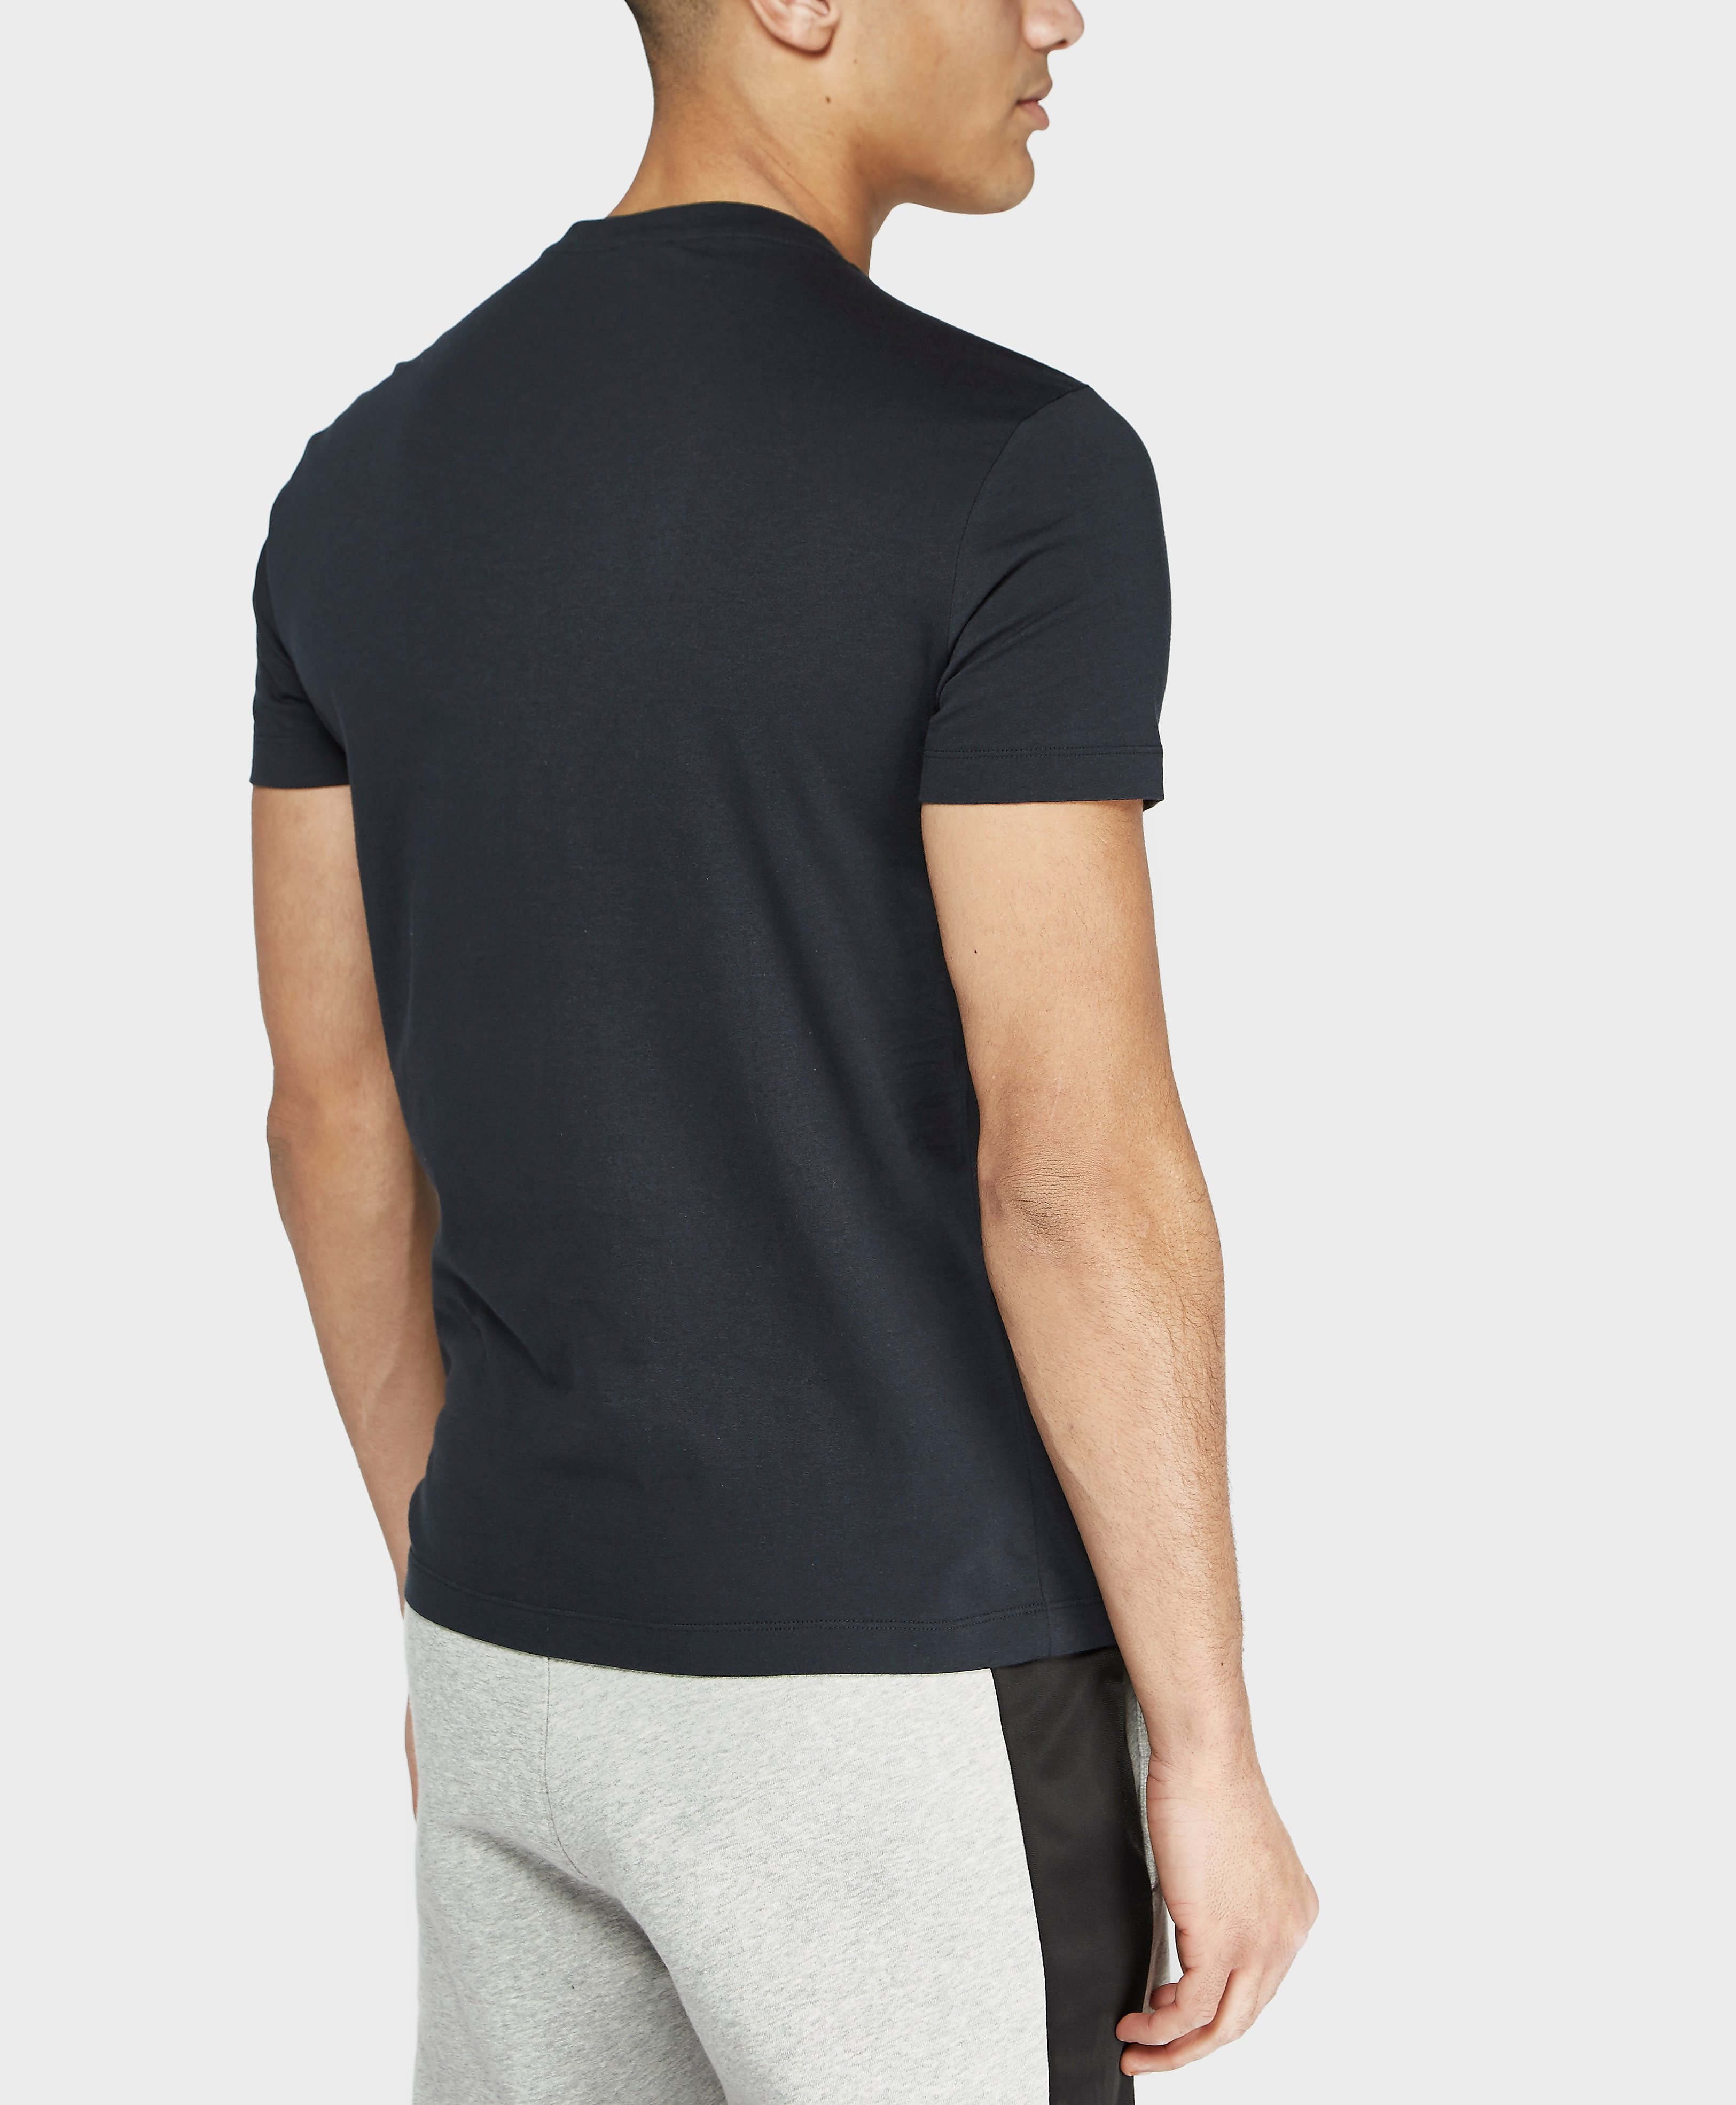 Emporio Armani EA7 Crew T-Shirt